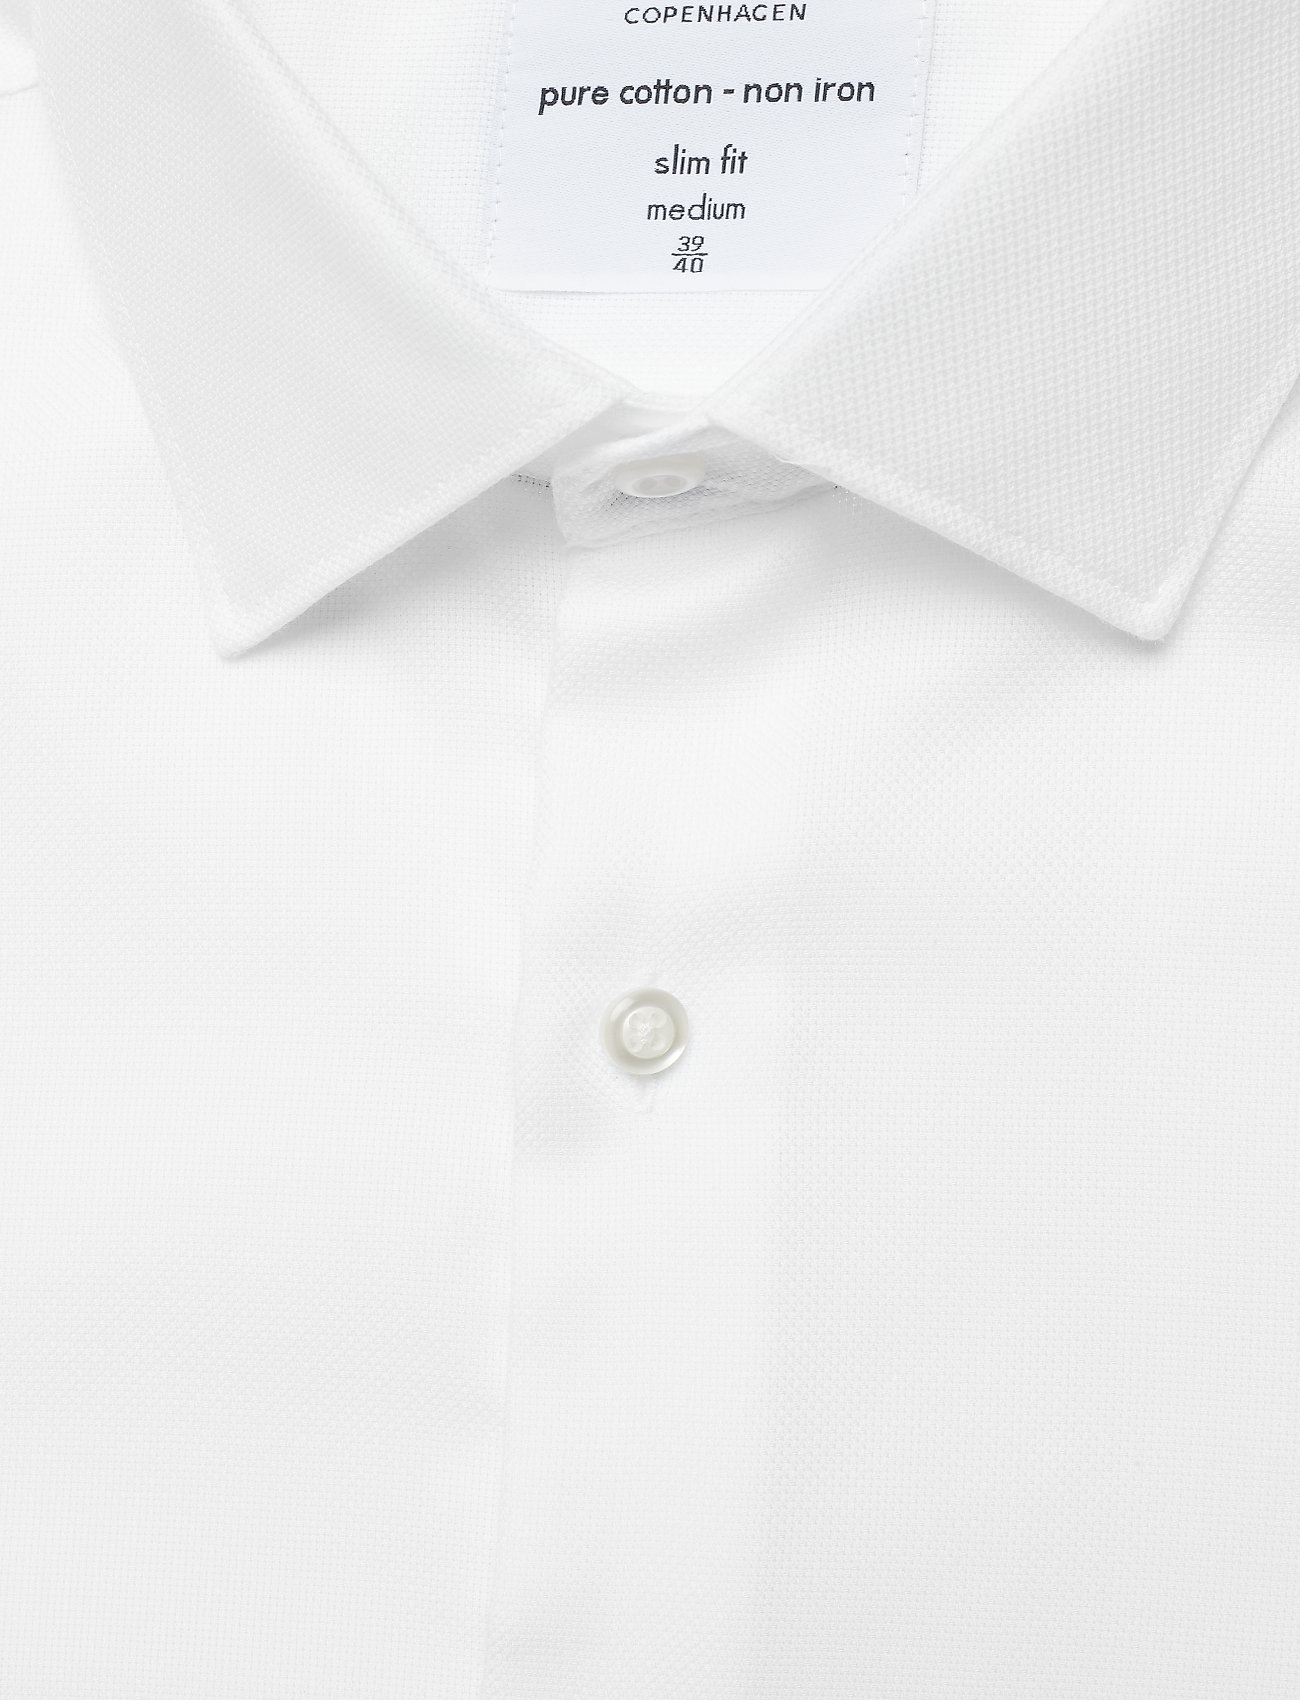 Dobby | Royal Oxford - Slim Fit (White) (47.20 €) - Seven Seas Copenhagen rQjXwHnr